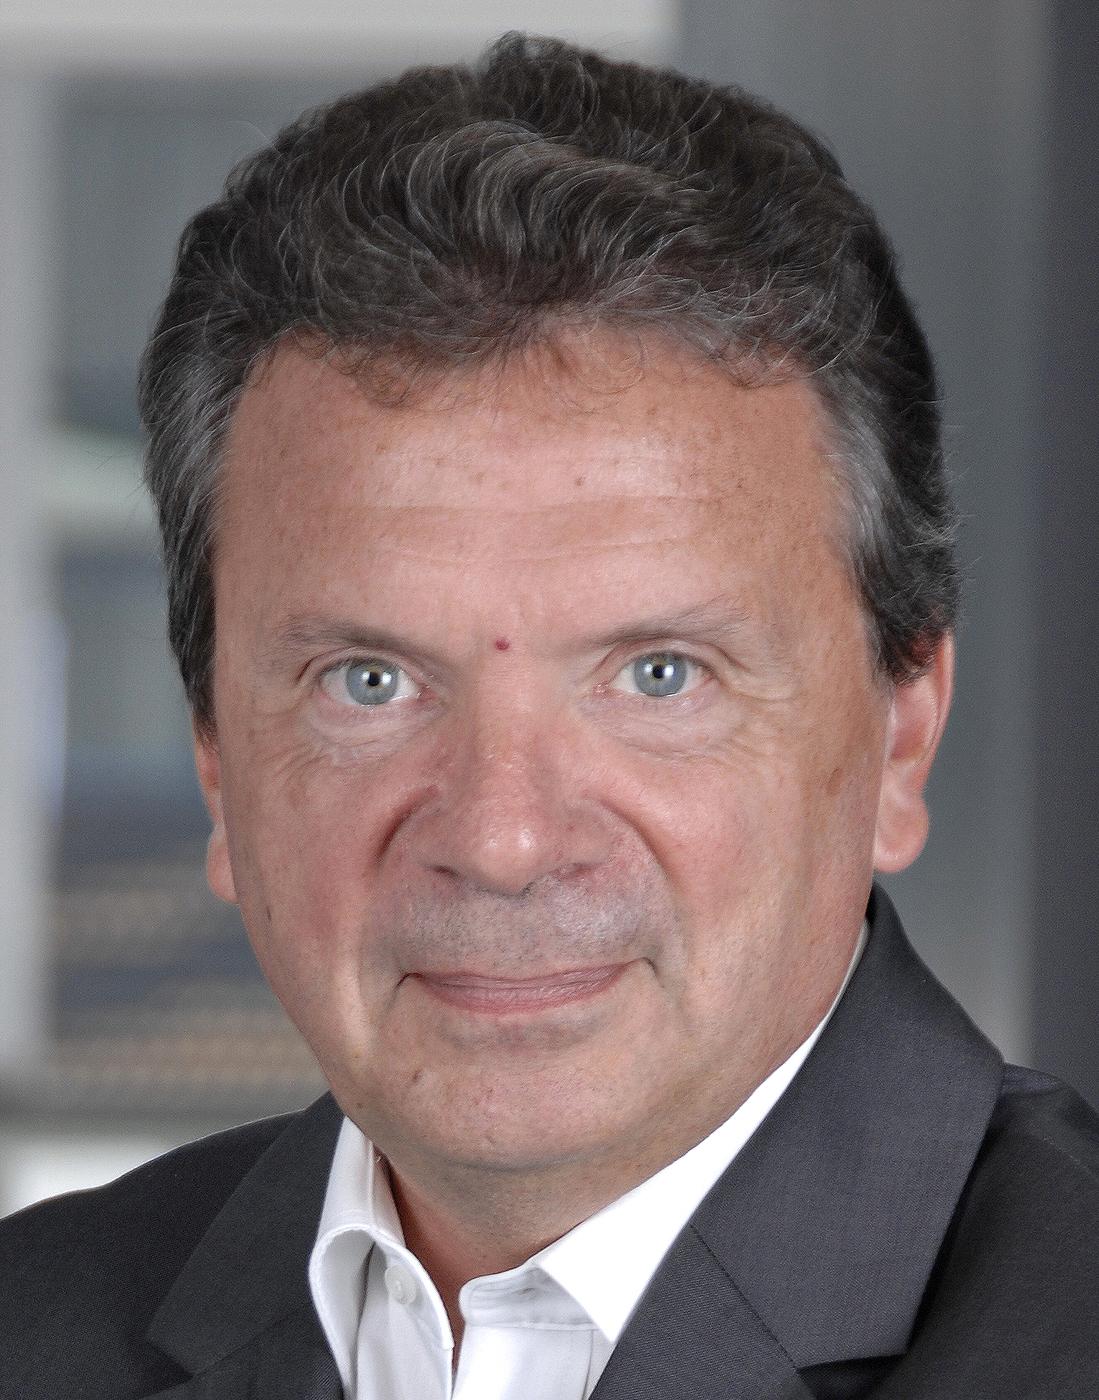 Arnaud ALADENISE - EPPENDORF - CIFL Comité interprofessionnel des fournisseurs du laboratoire